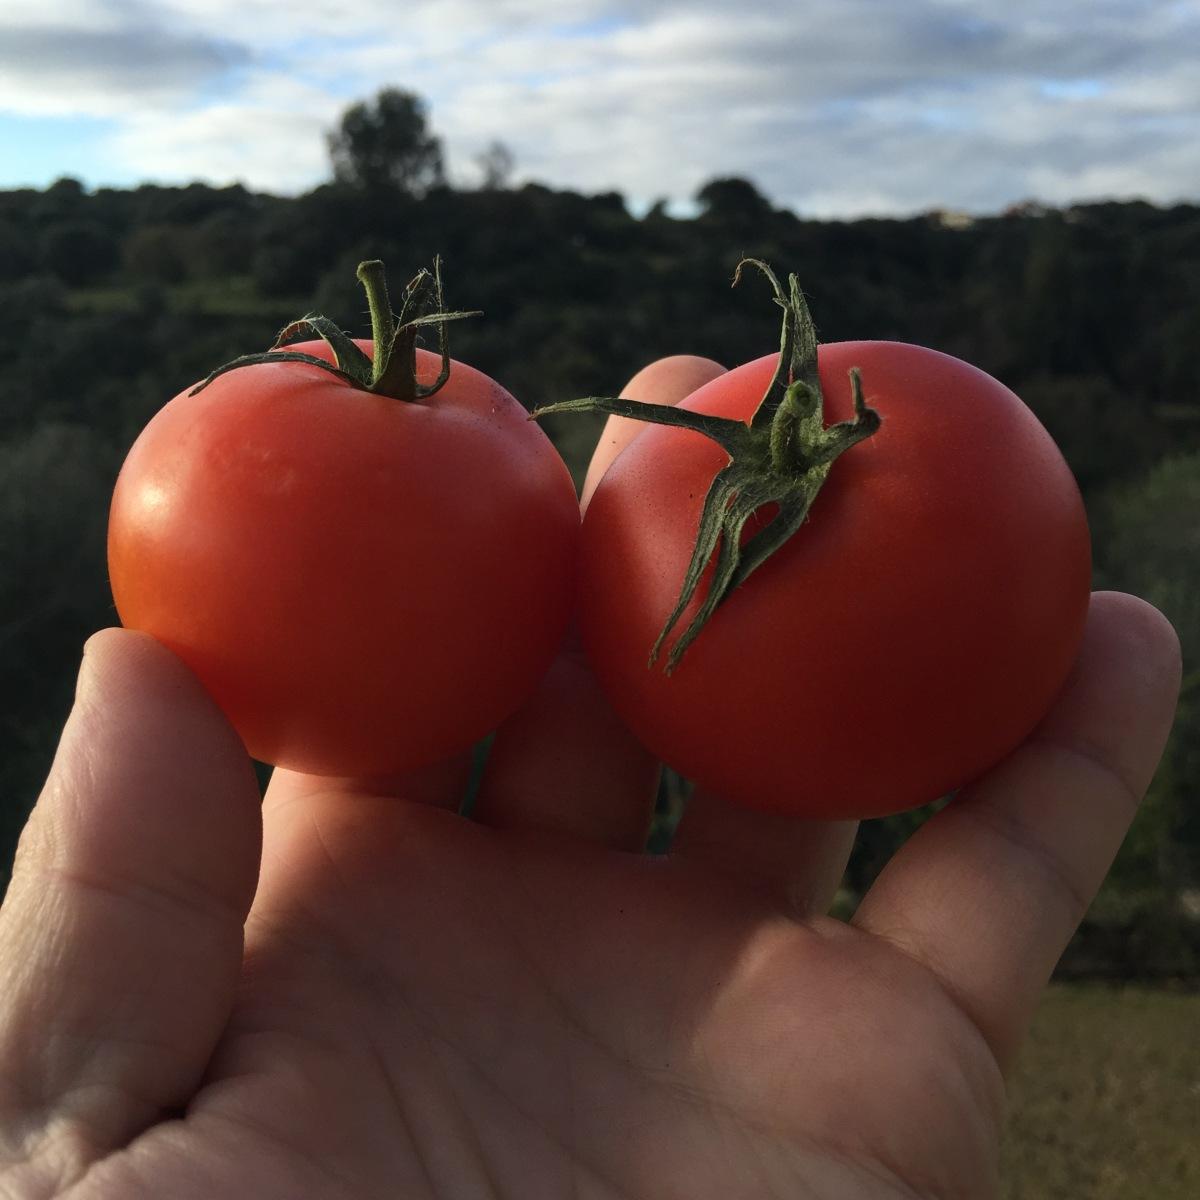 You Like Tomato. And I LikeTomato.